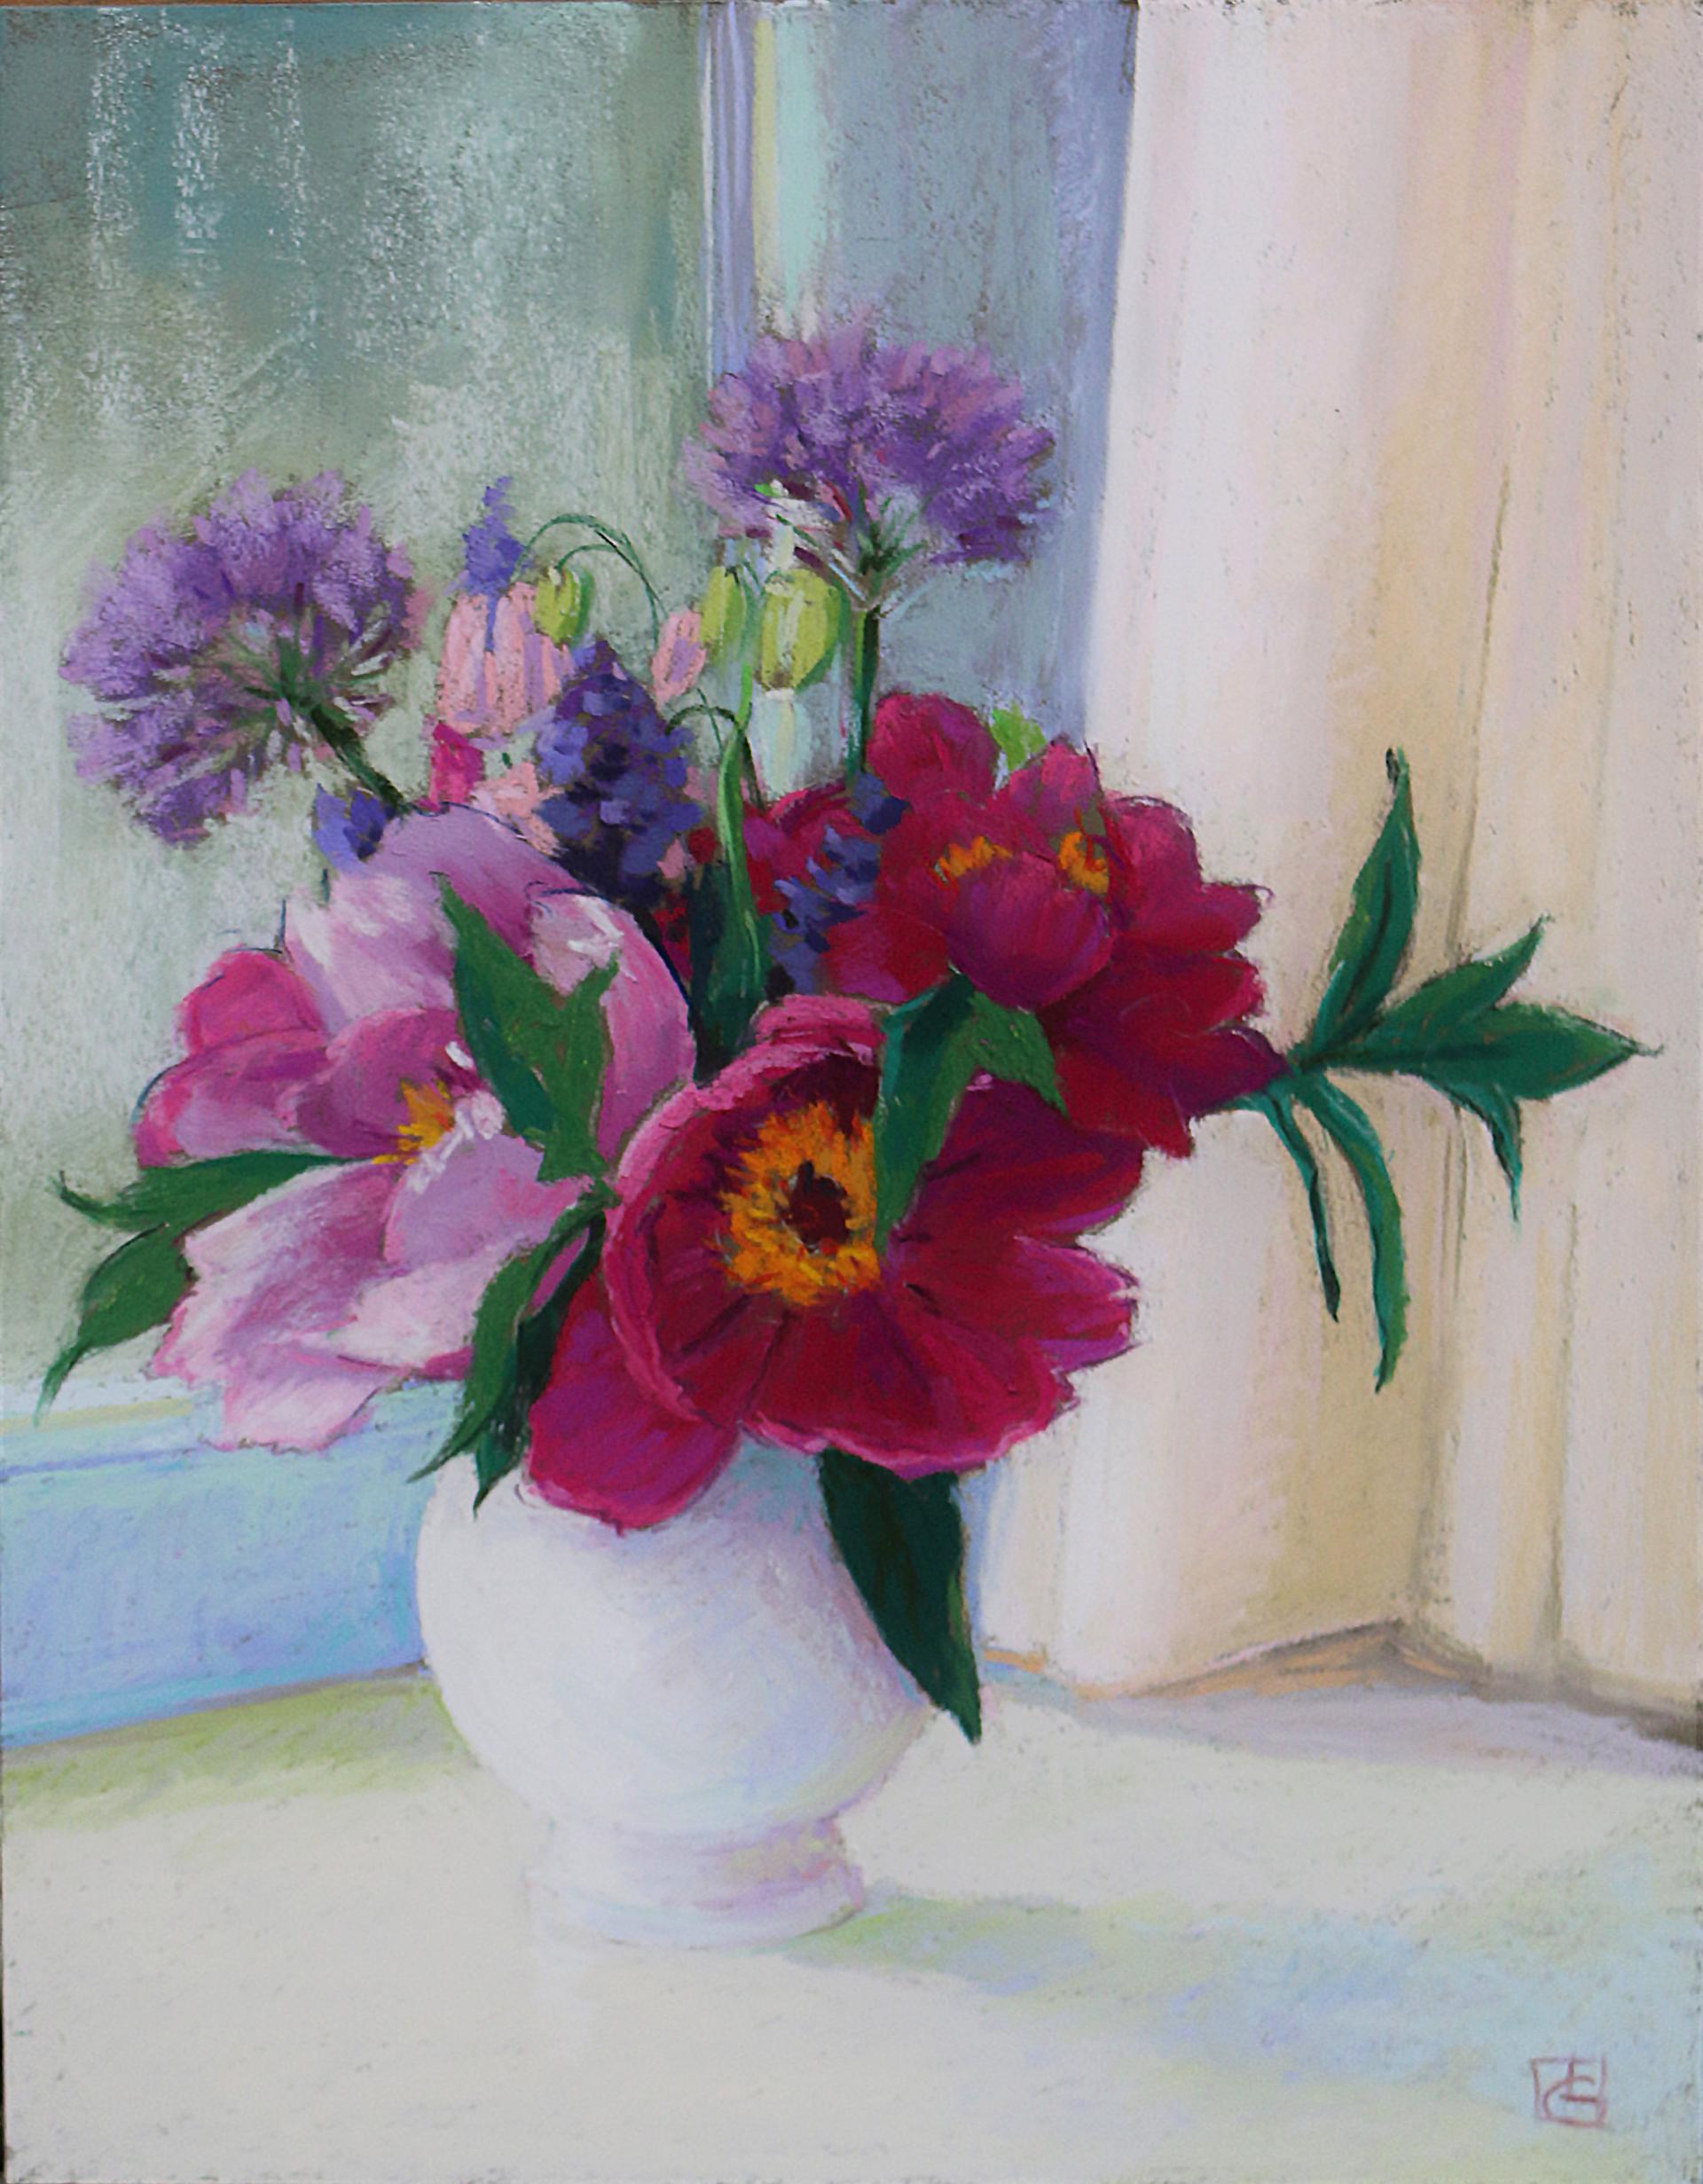 Pink Tulips by Lisa Gleim